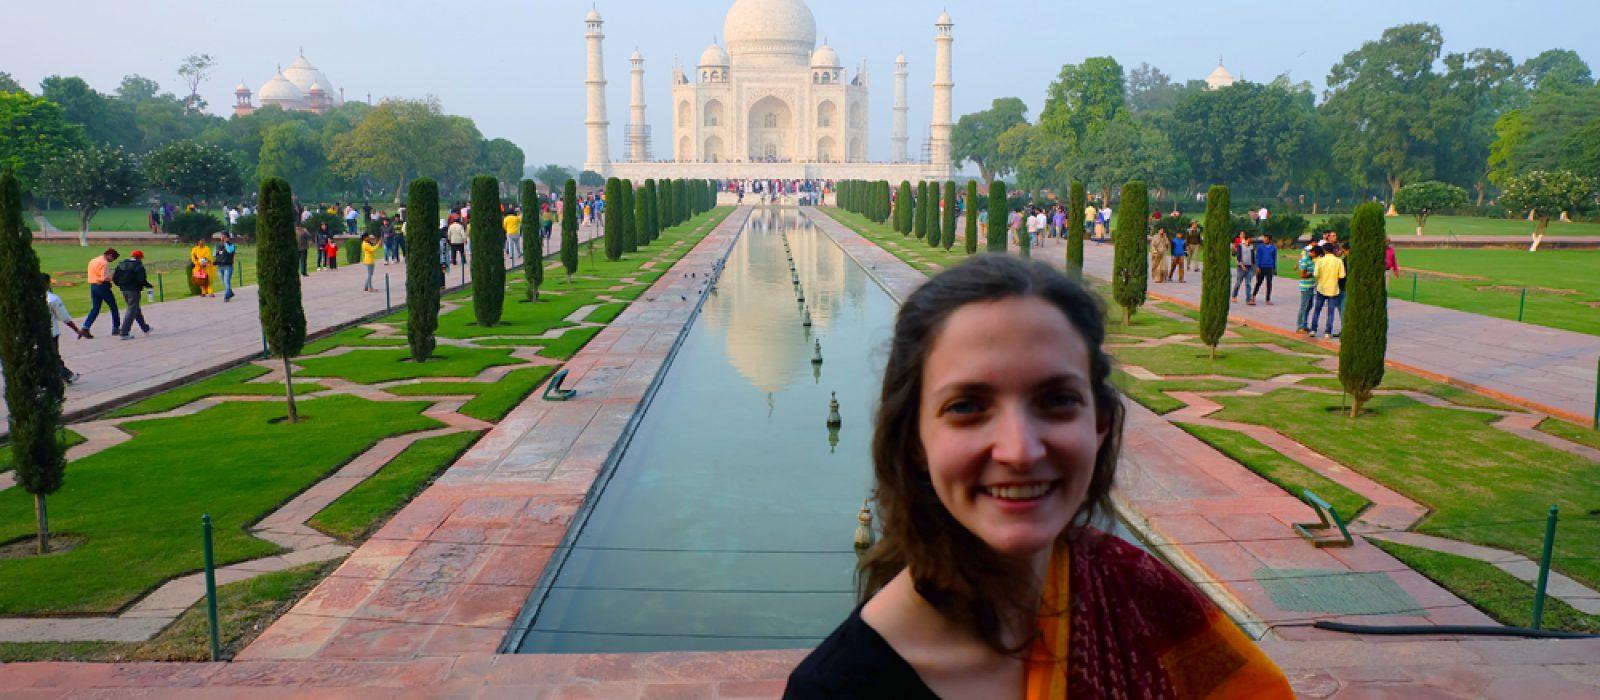 An Indian Jewel: The Taj Mahal